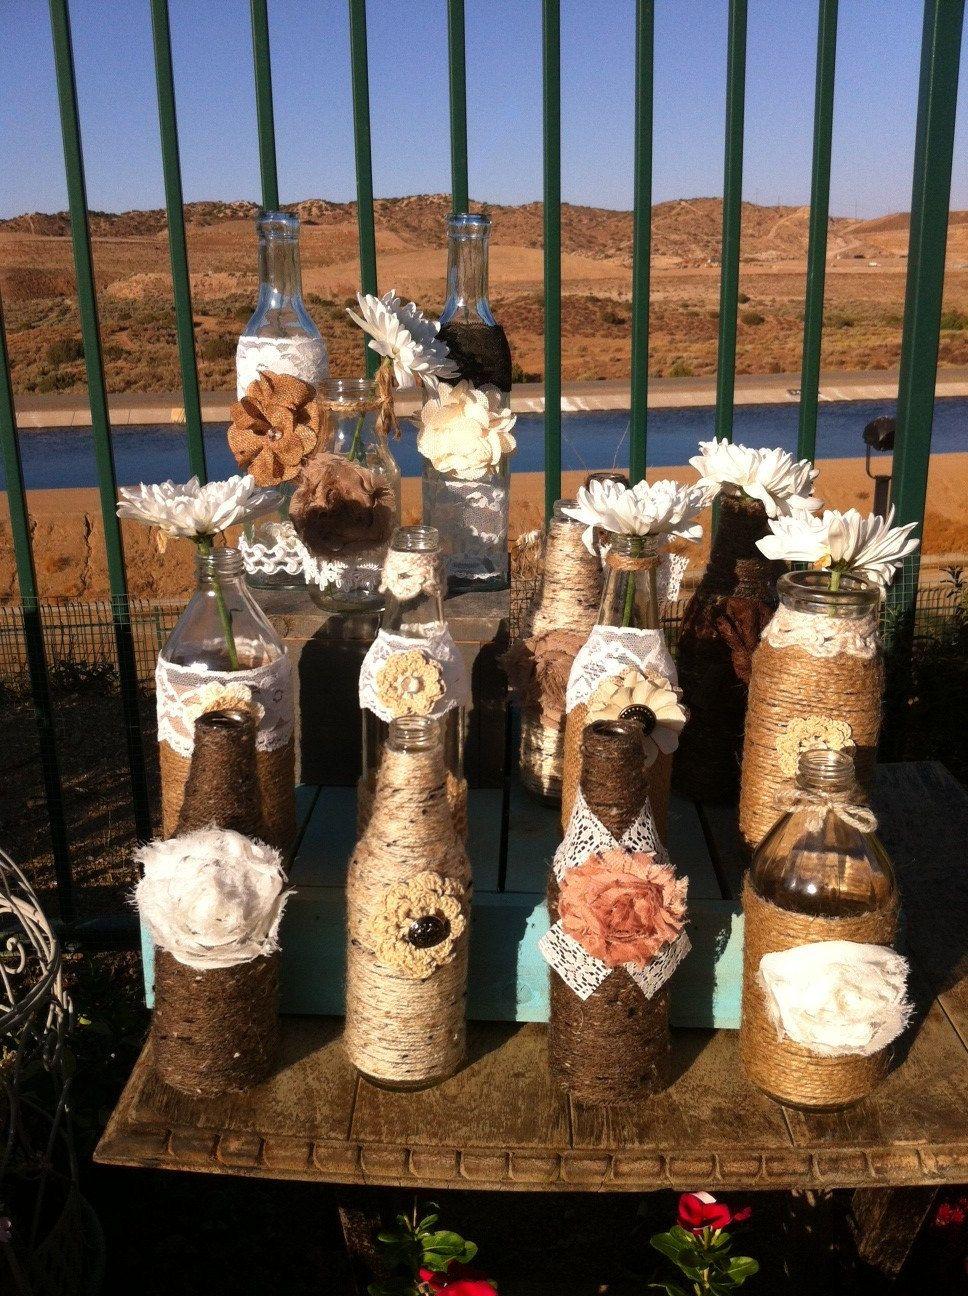 Vintage Rustic Chic Wedding Vase Bottle Centerpieces -2204